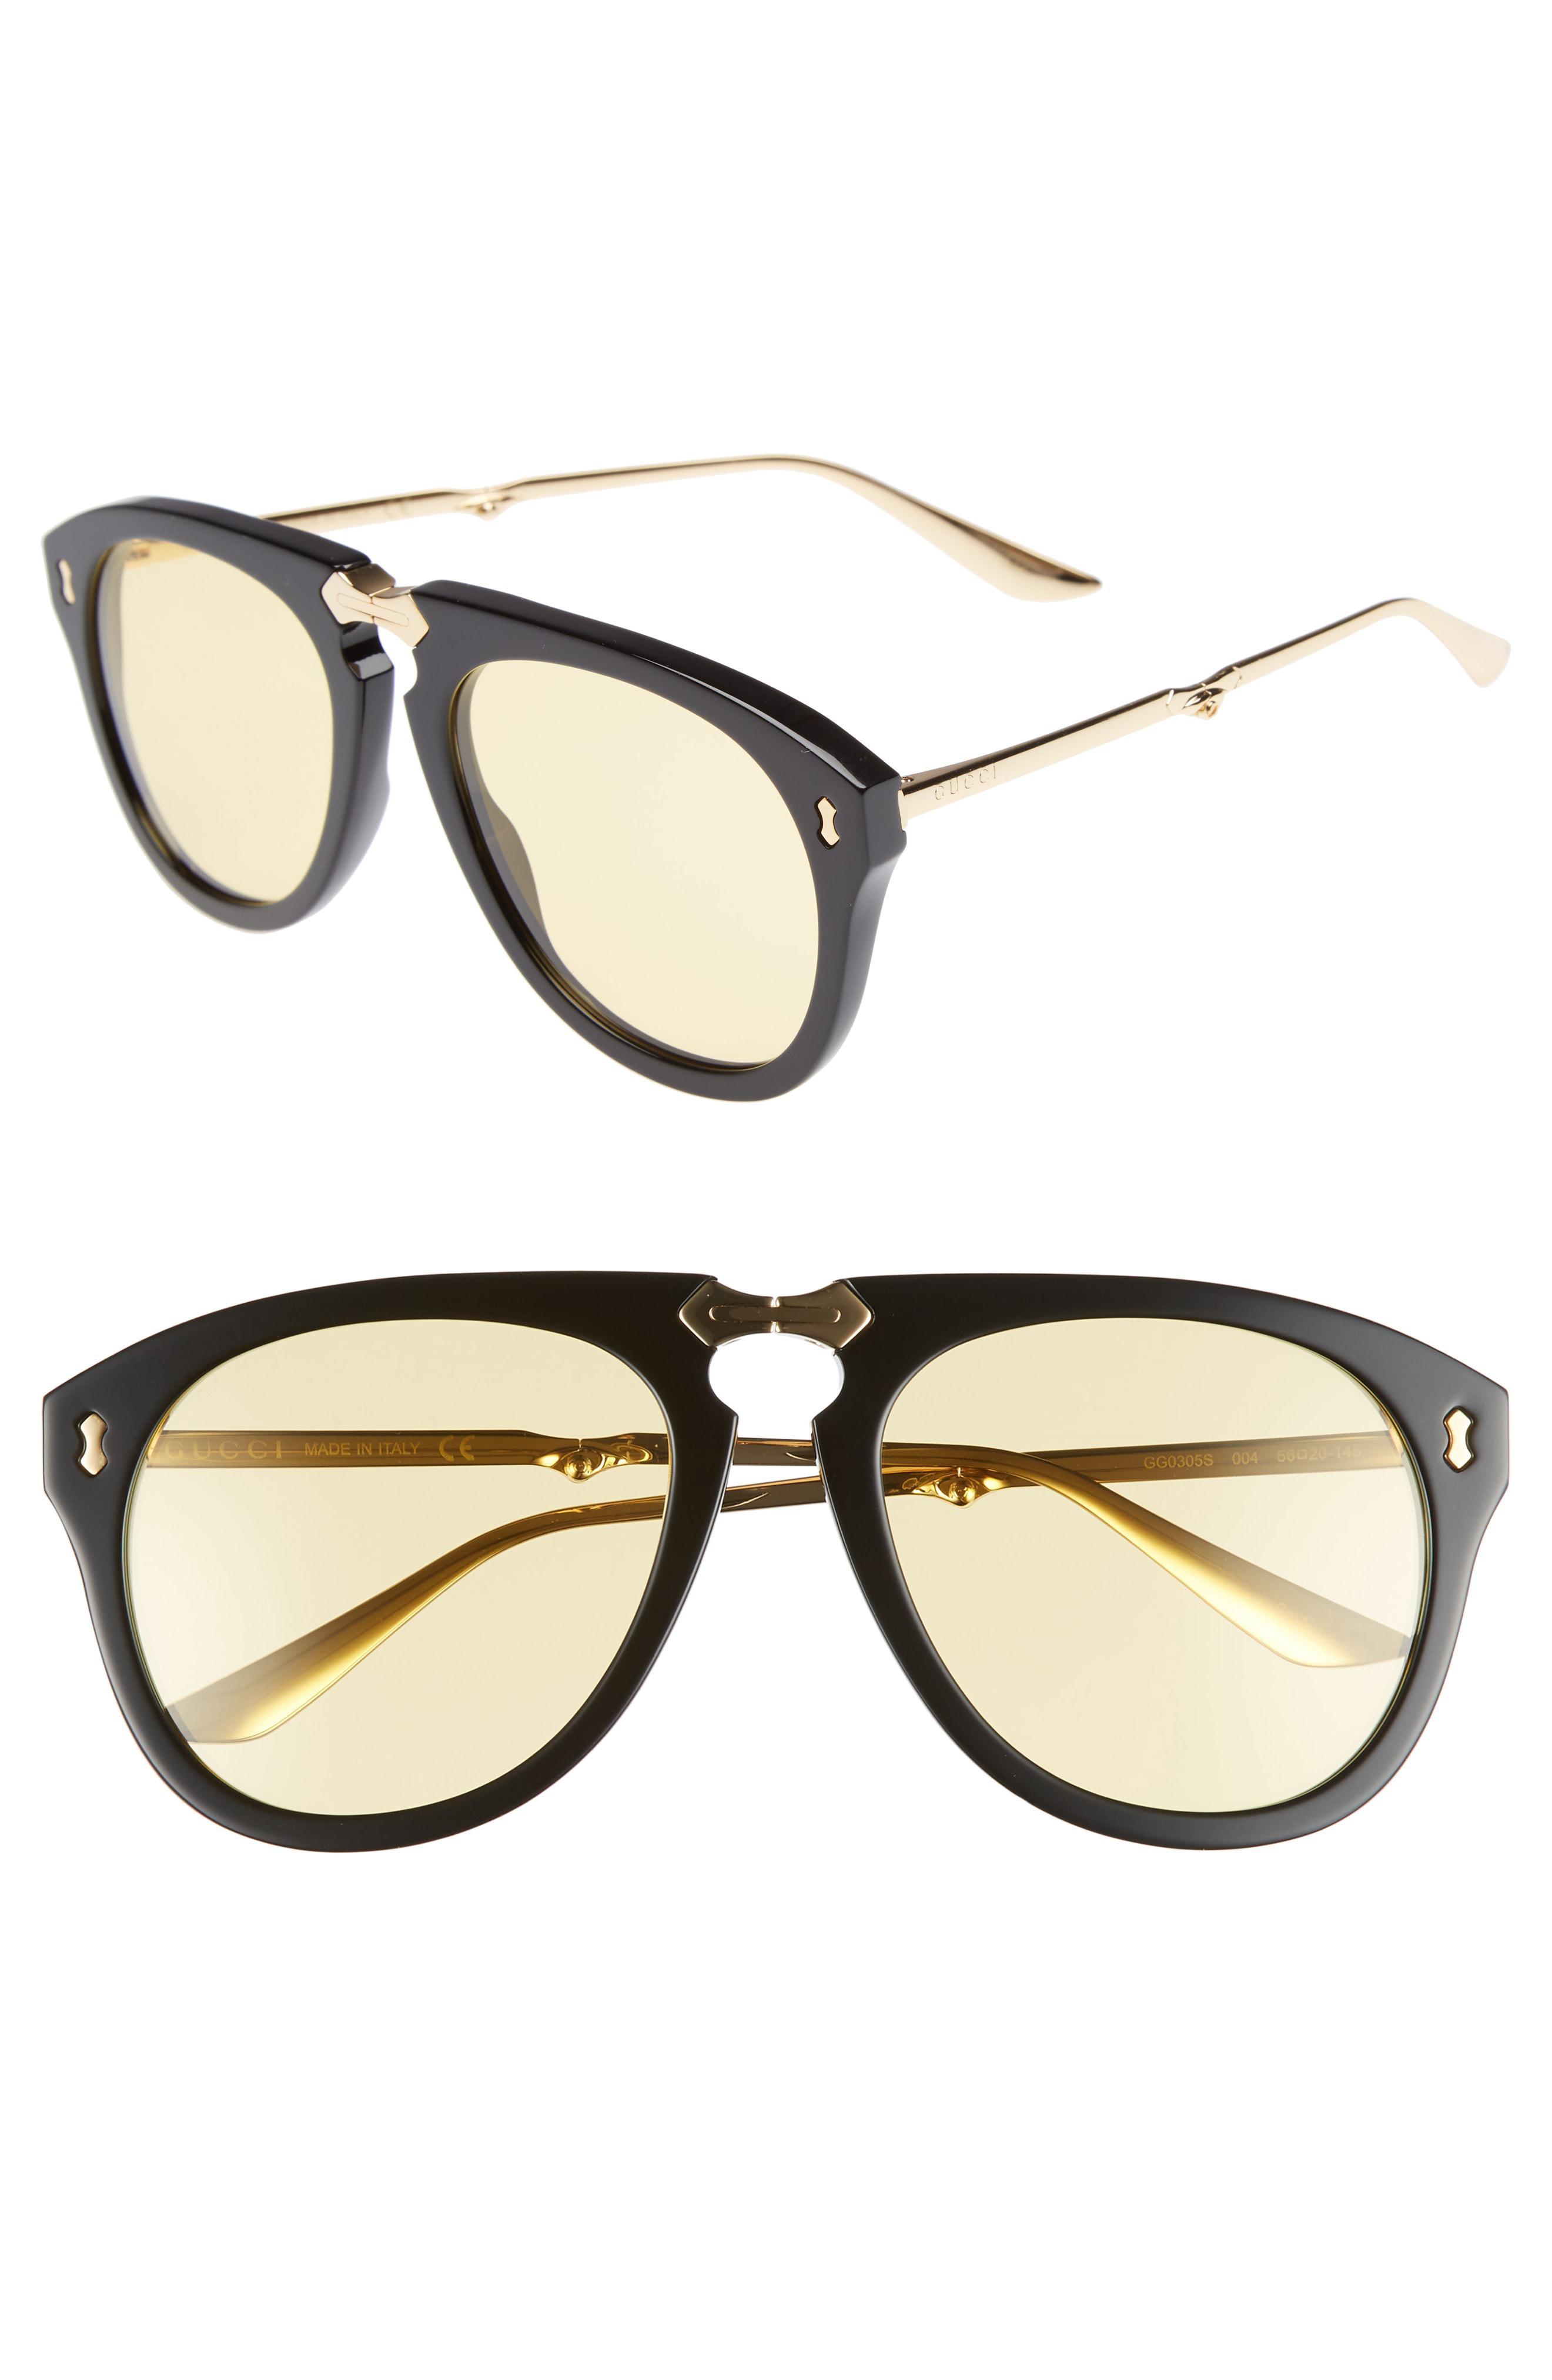 e439dc1a09 Lyst - Gucci Big Rivets 56mm Aviator Sunglasses - in Metallic for Men